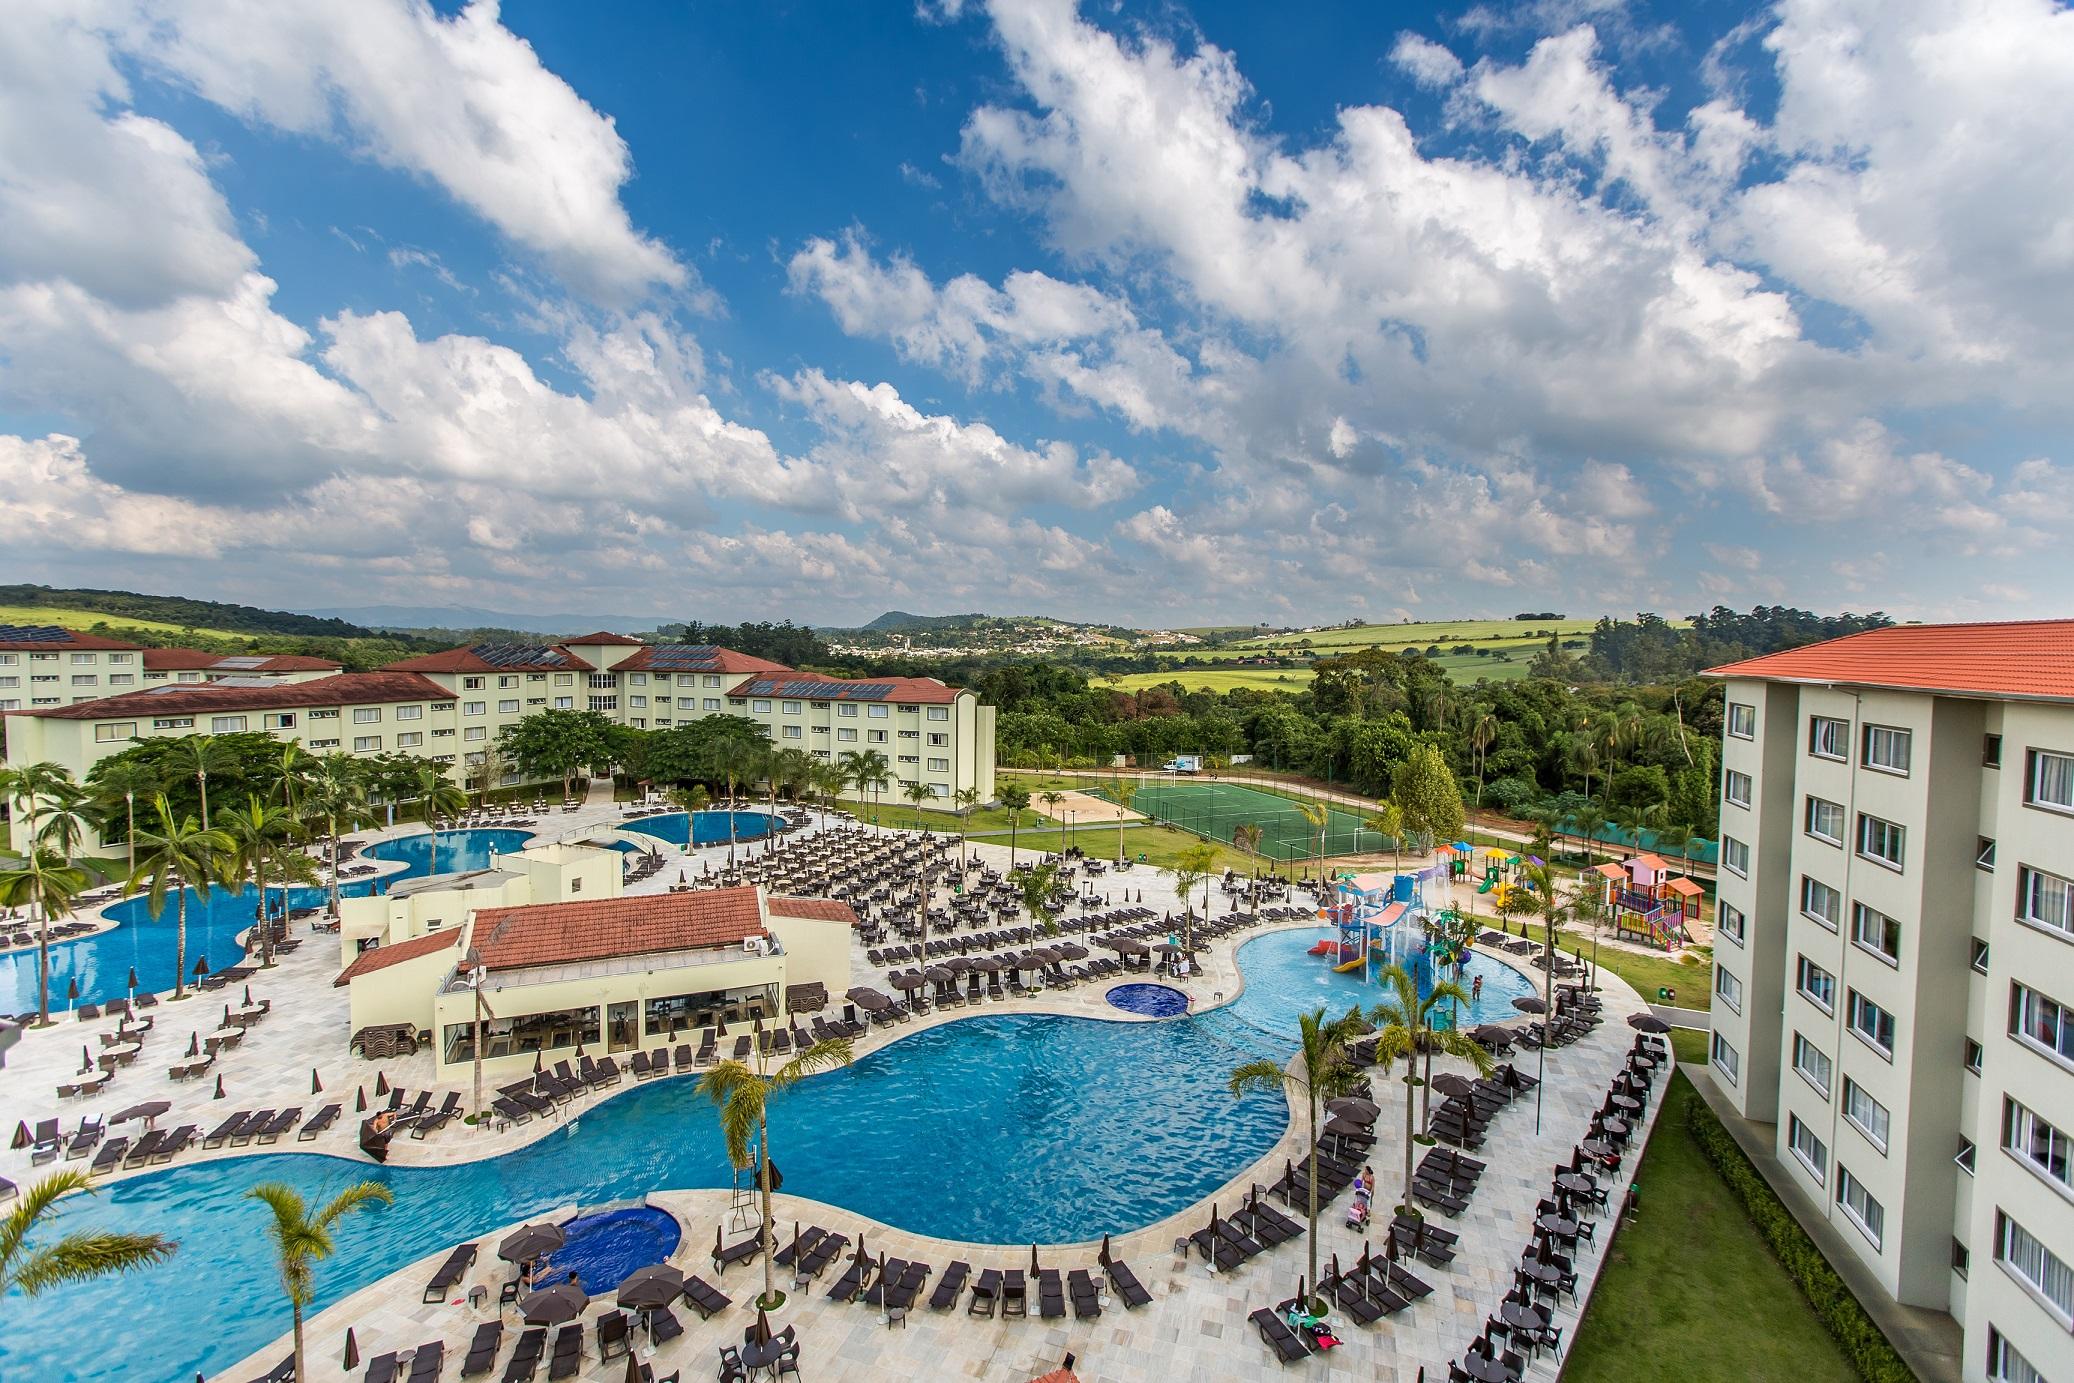 Vista piscina_Tauá Resort & Convention Atibaia